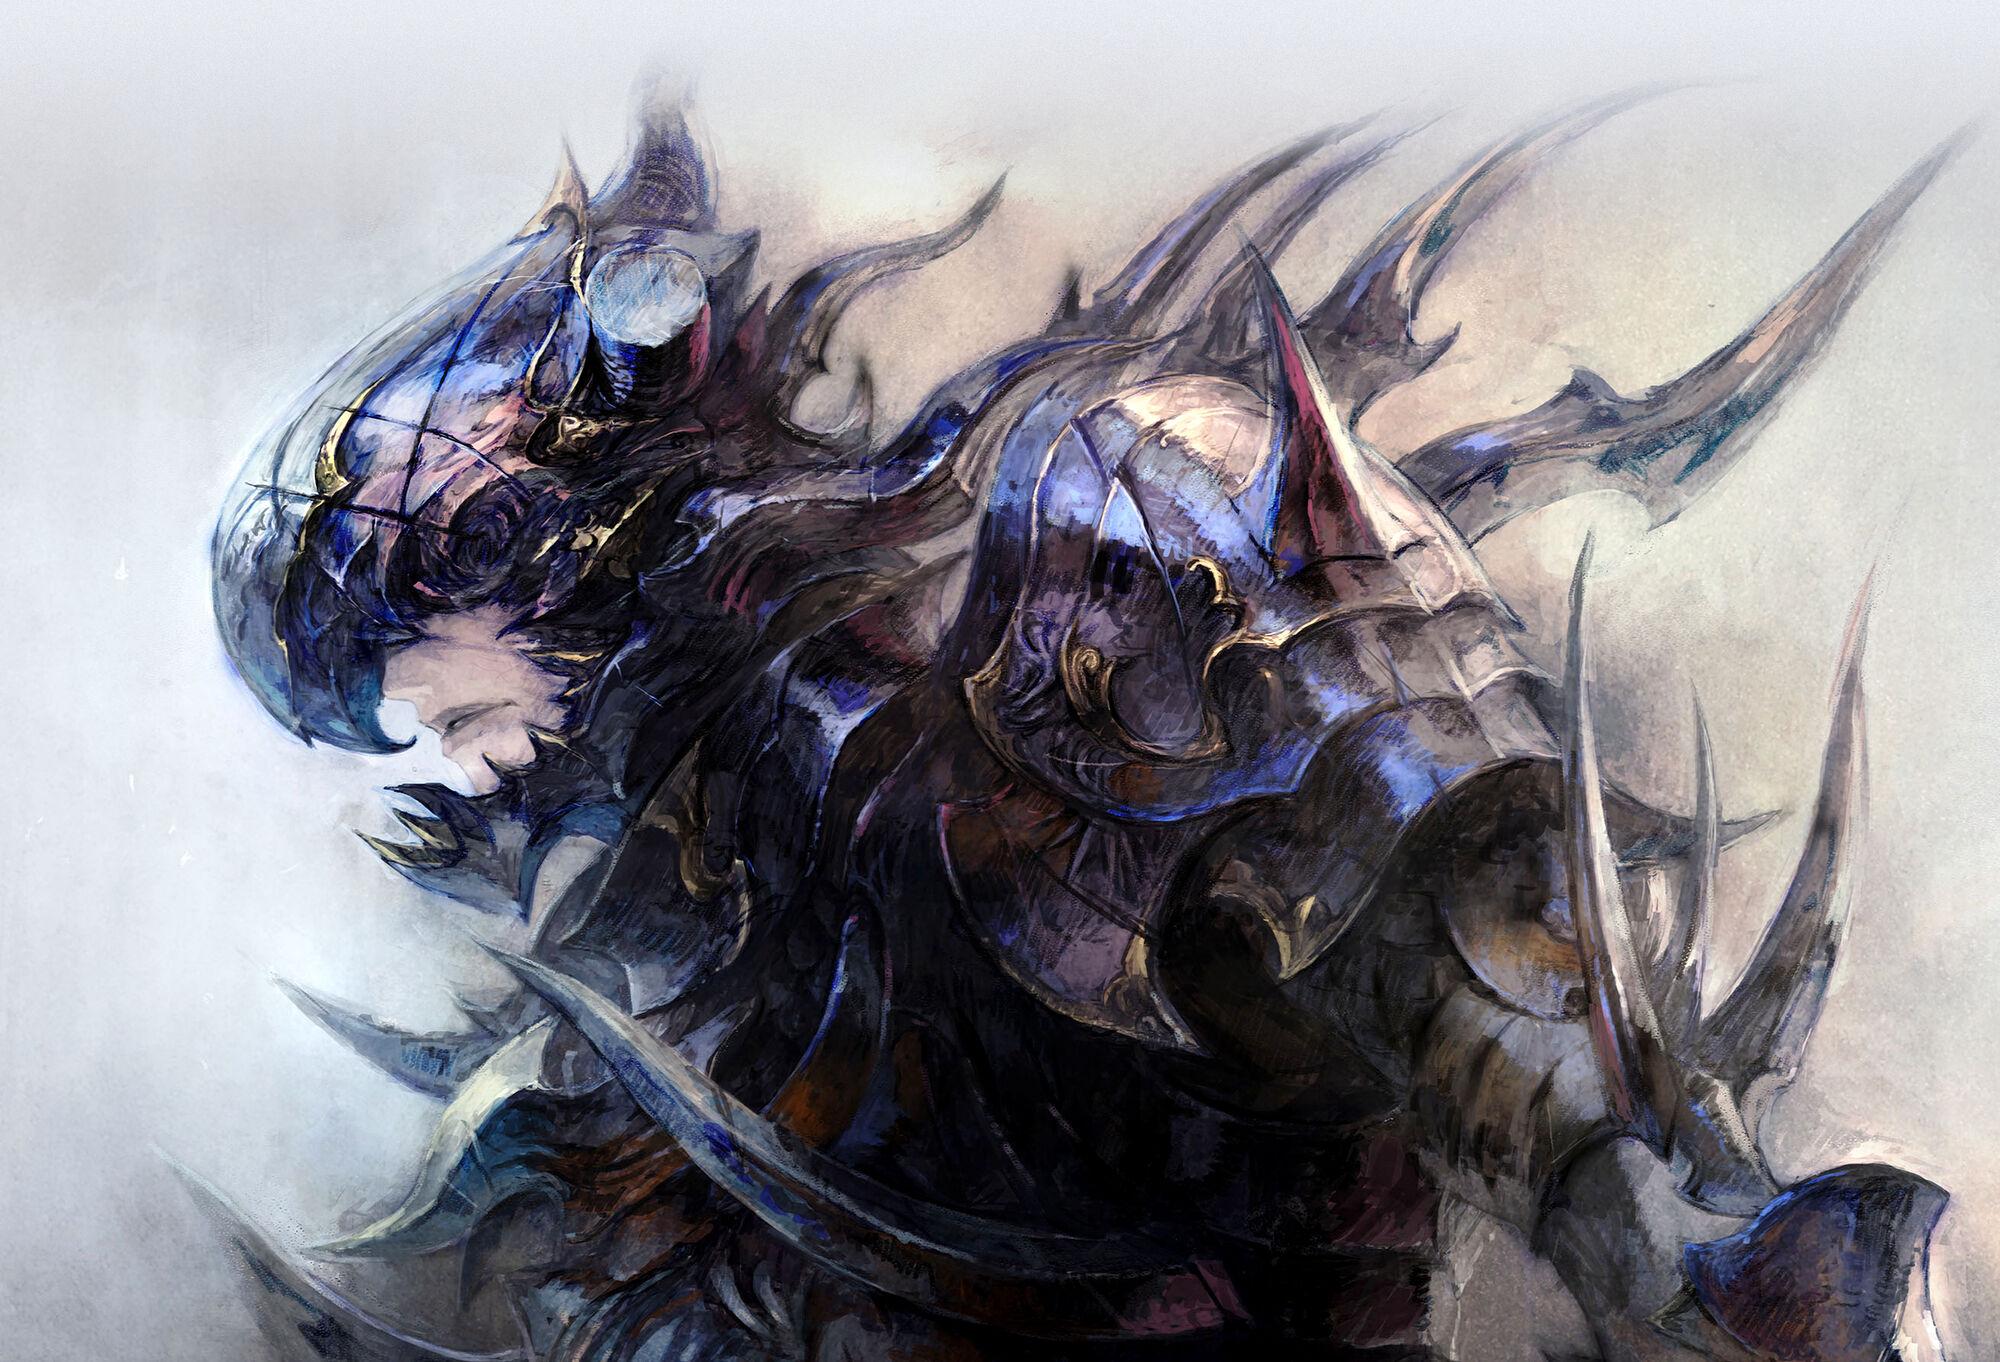 Drag On Dragoon 4k Wallpaper: Final Fantasy Wiki:Featured Images/Estinien Wyrmblood